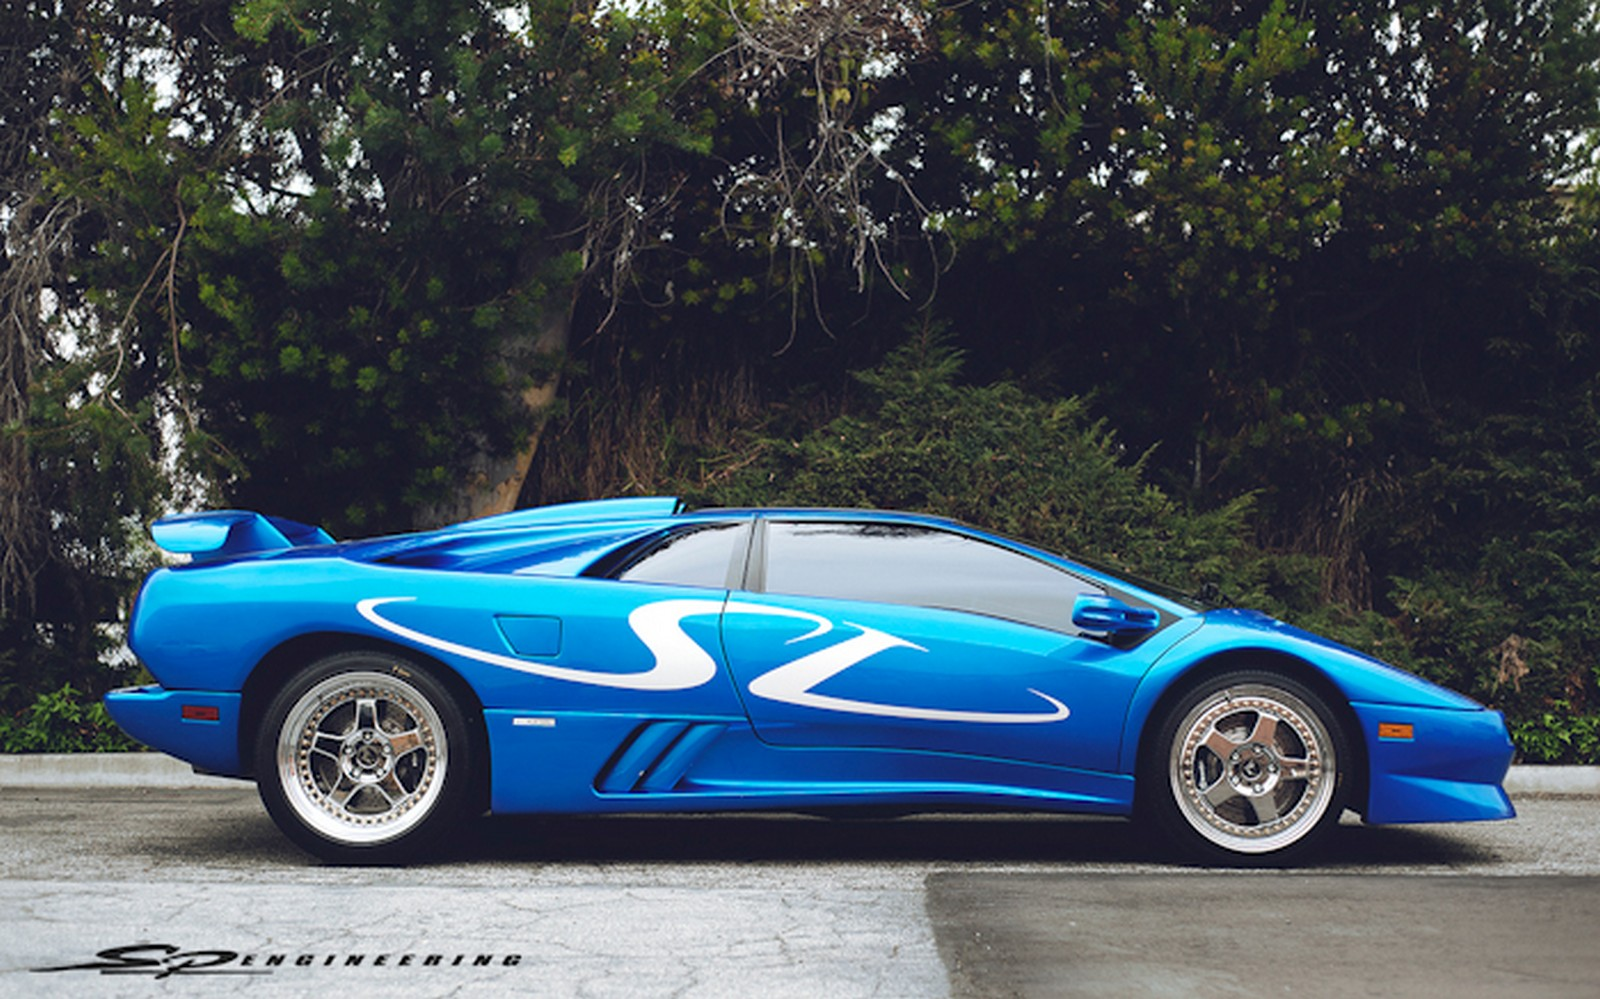 1998 Lamborghini Diablo Sv Monterey Edition By Sp Engineering Gtspirit